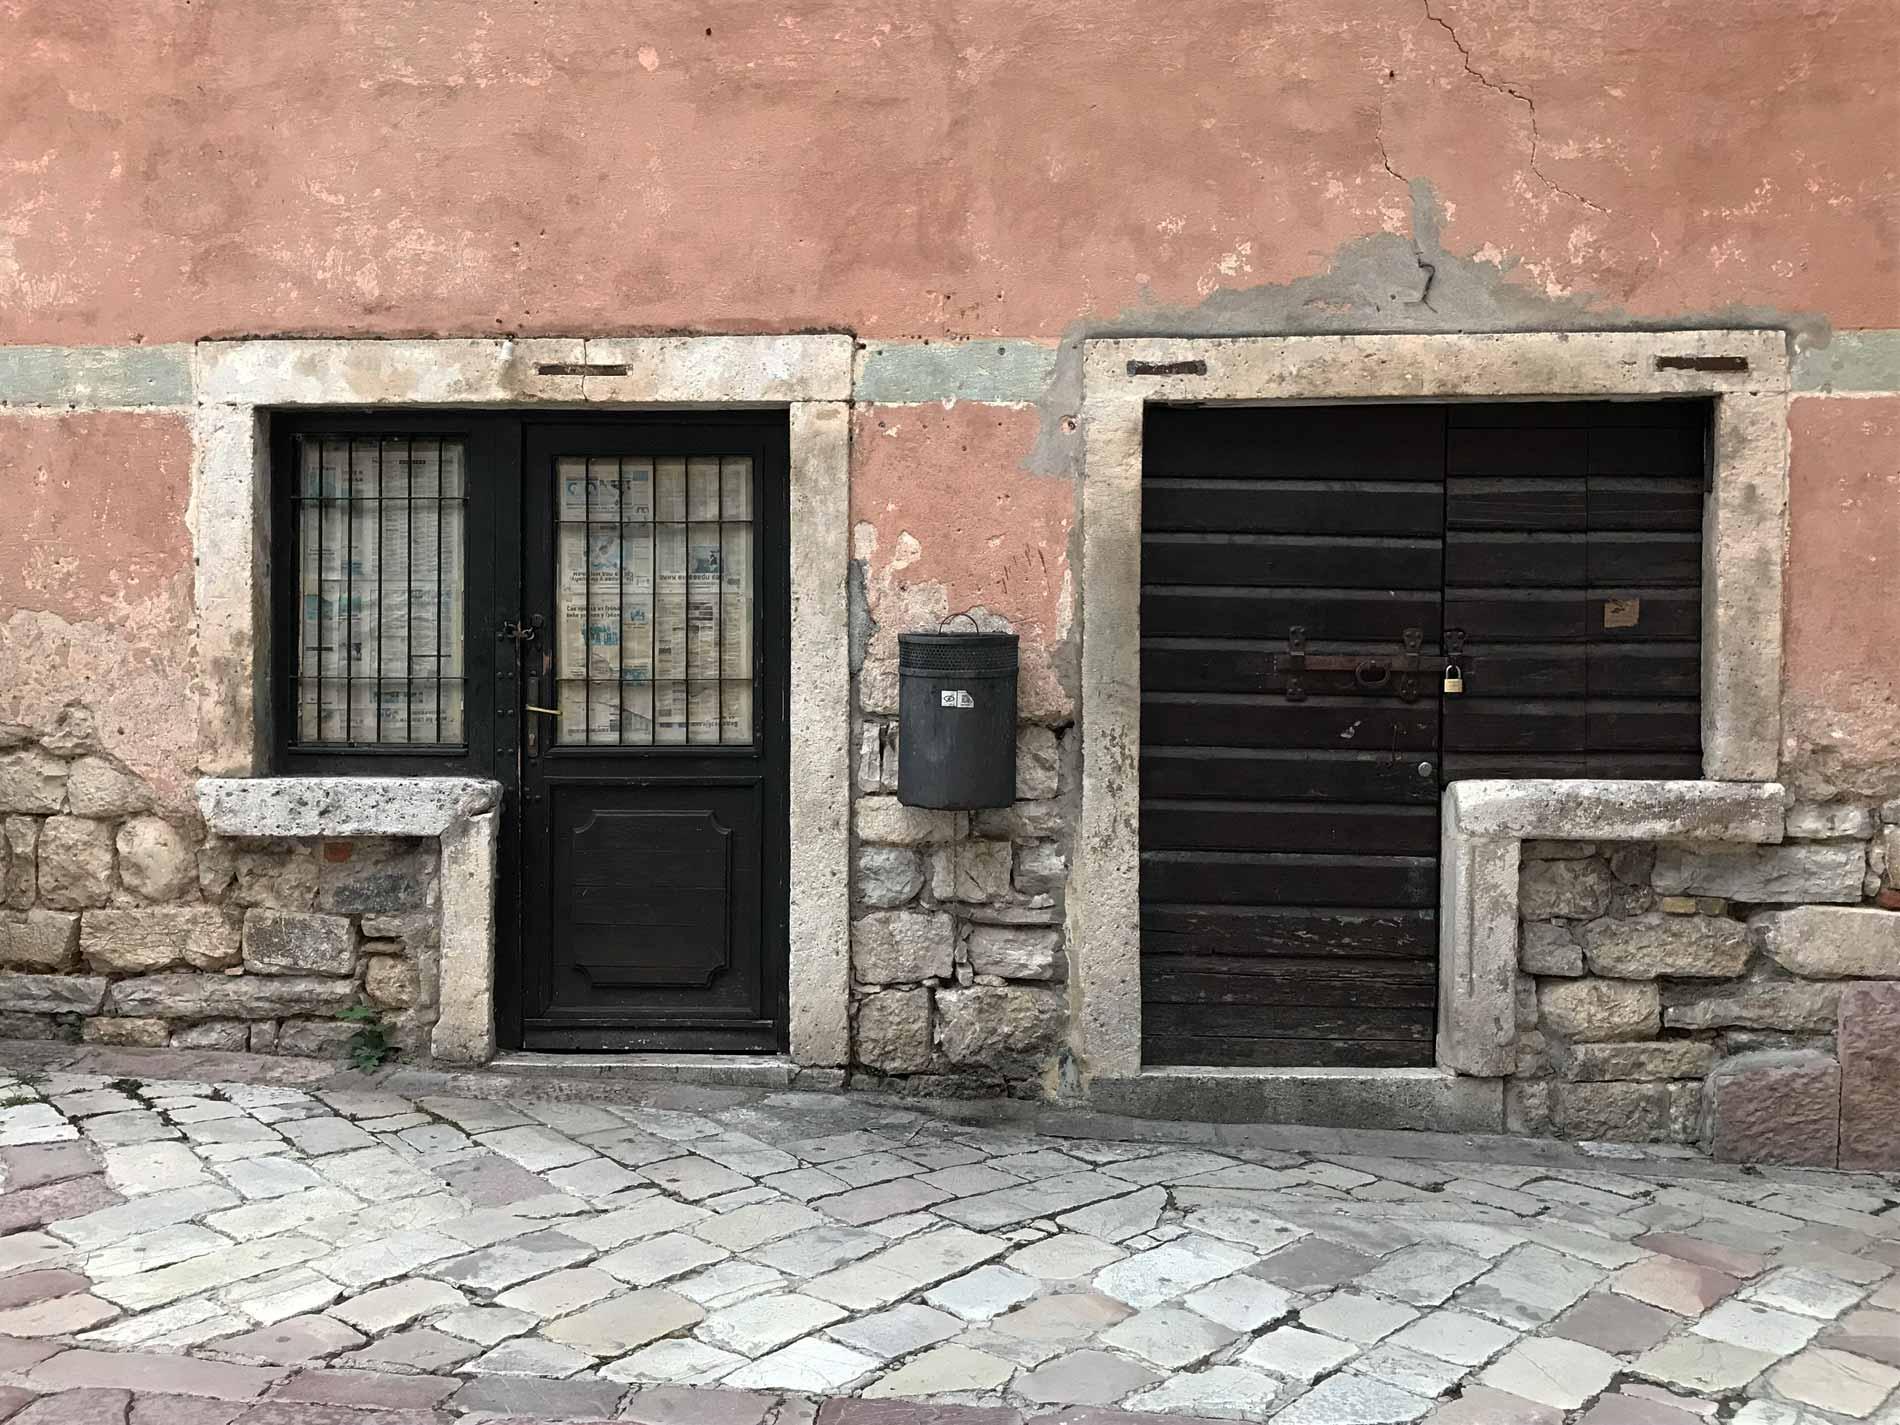 Kotor-Montenegro-centro-storico-case-porta-finestra-strana